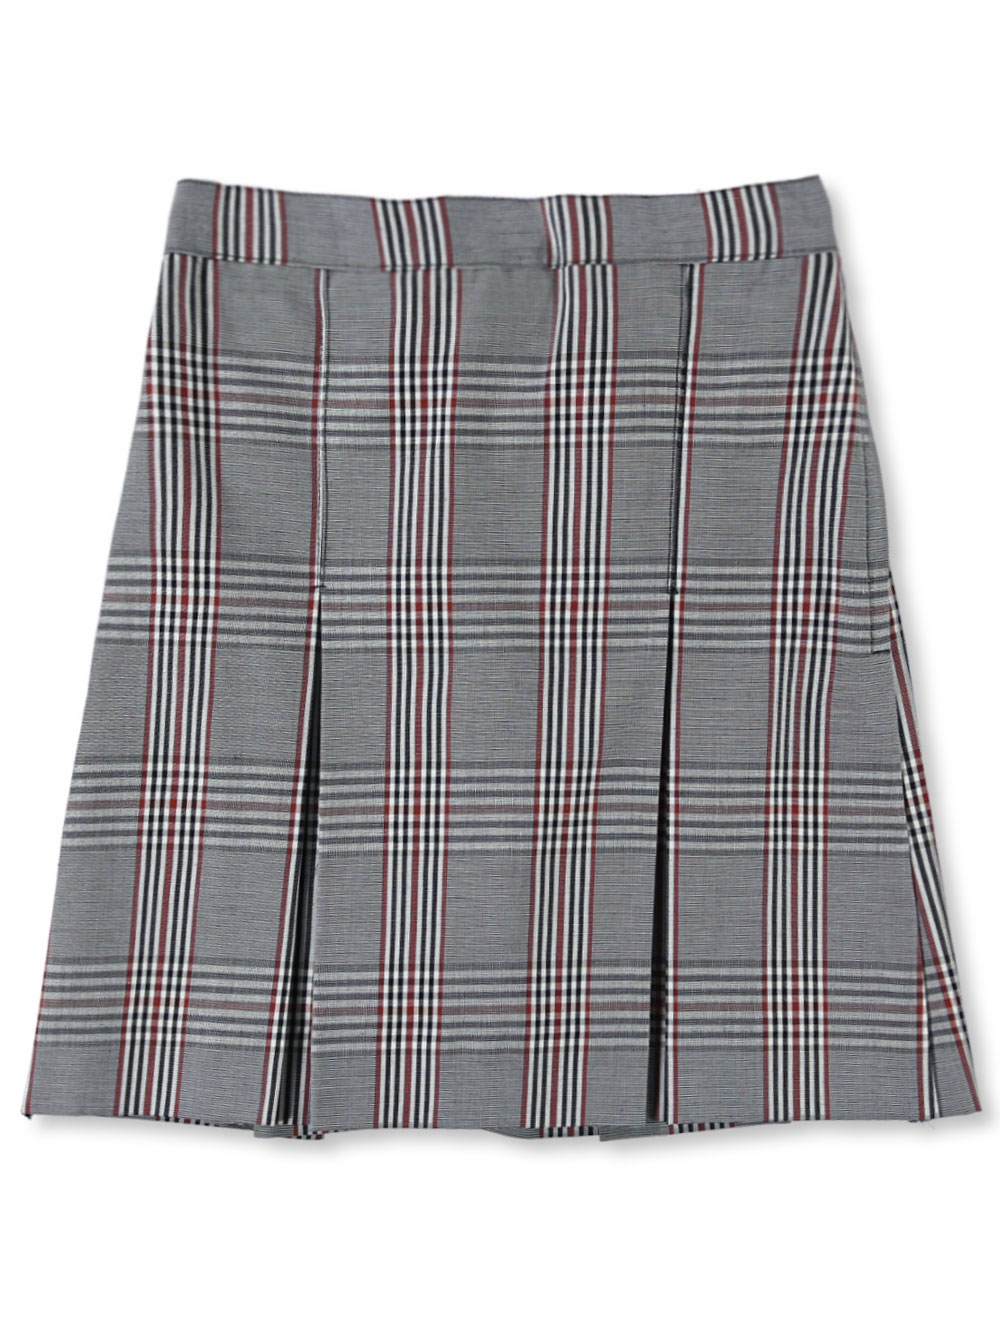 CookiesKids Brand Cookie's Brand Big Girls' Box Pleat Skirt (Sizes 7 - 16) - white/black/rust *plaid #08* polycotton, 18